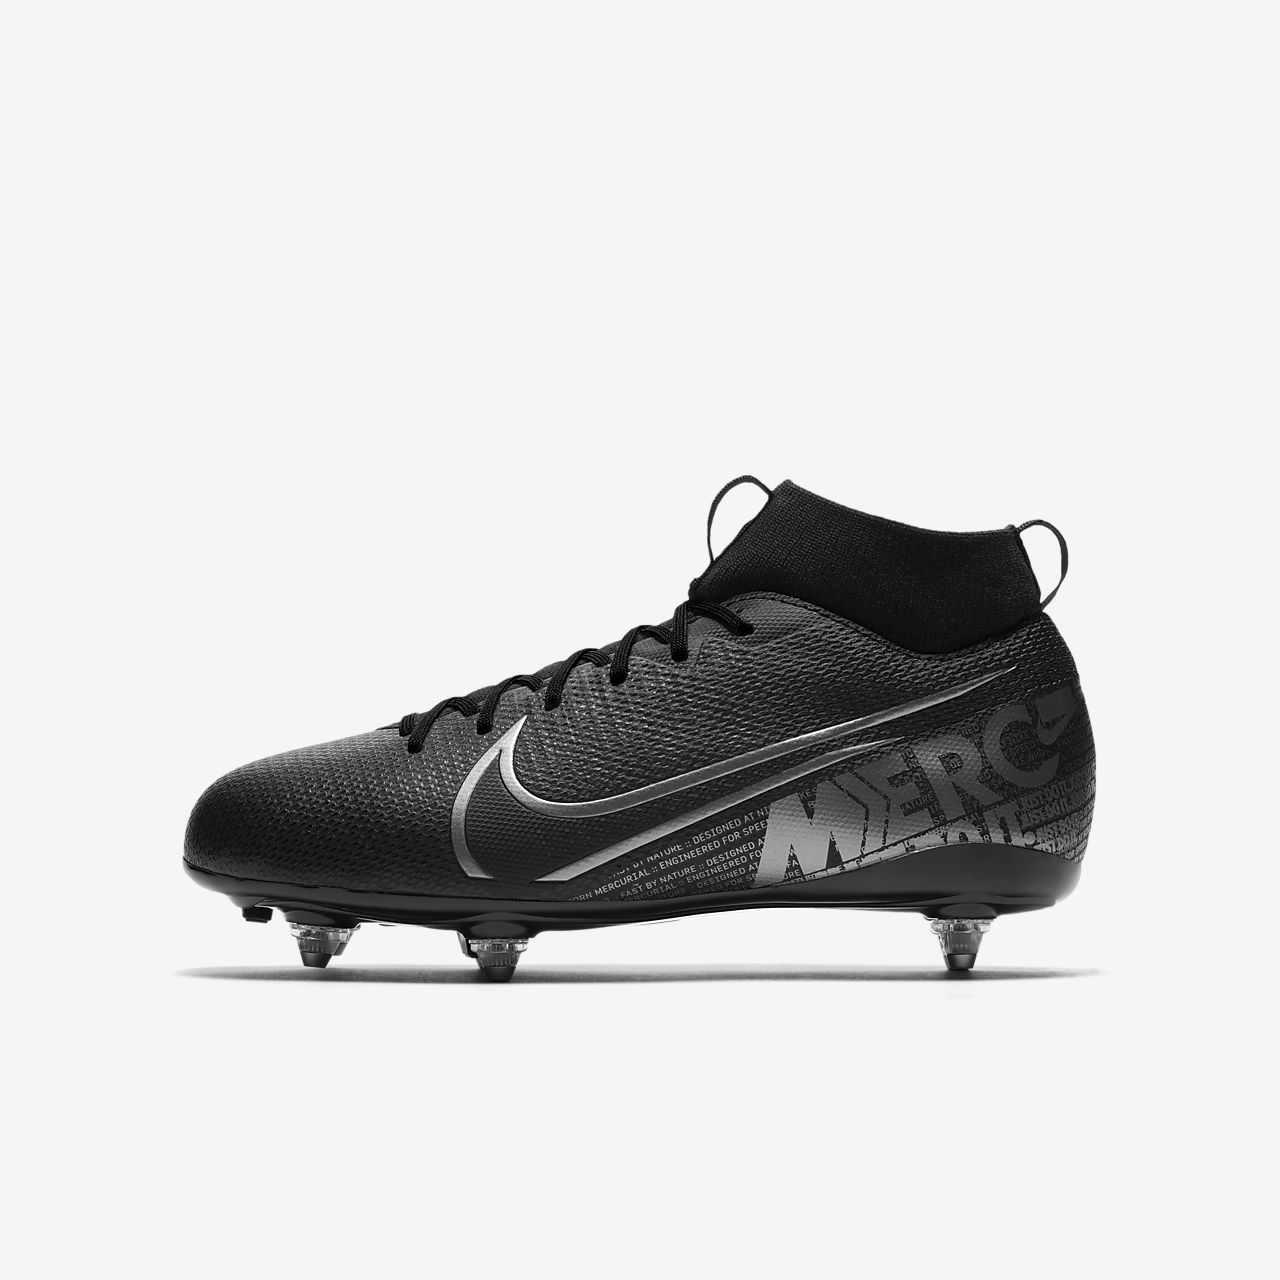 Nike Jr. Mercurial Superfly 7 Academy SG Botes de futbol per a terreny tou - Nen/a i nen/a petit/a